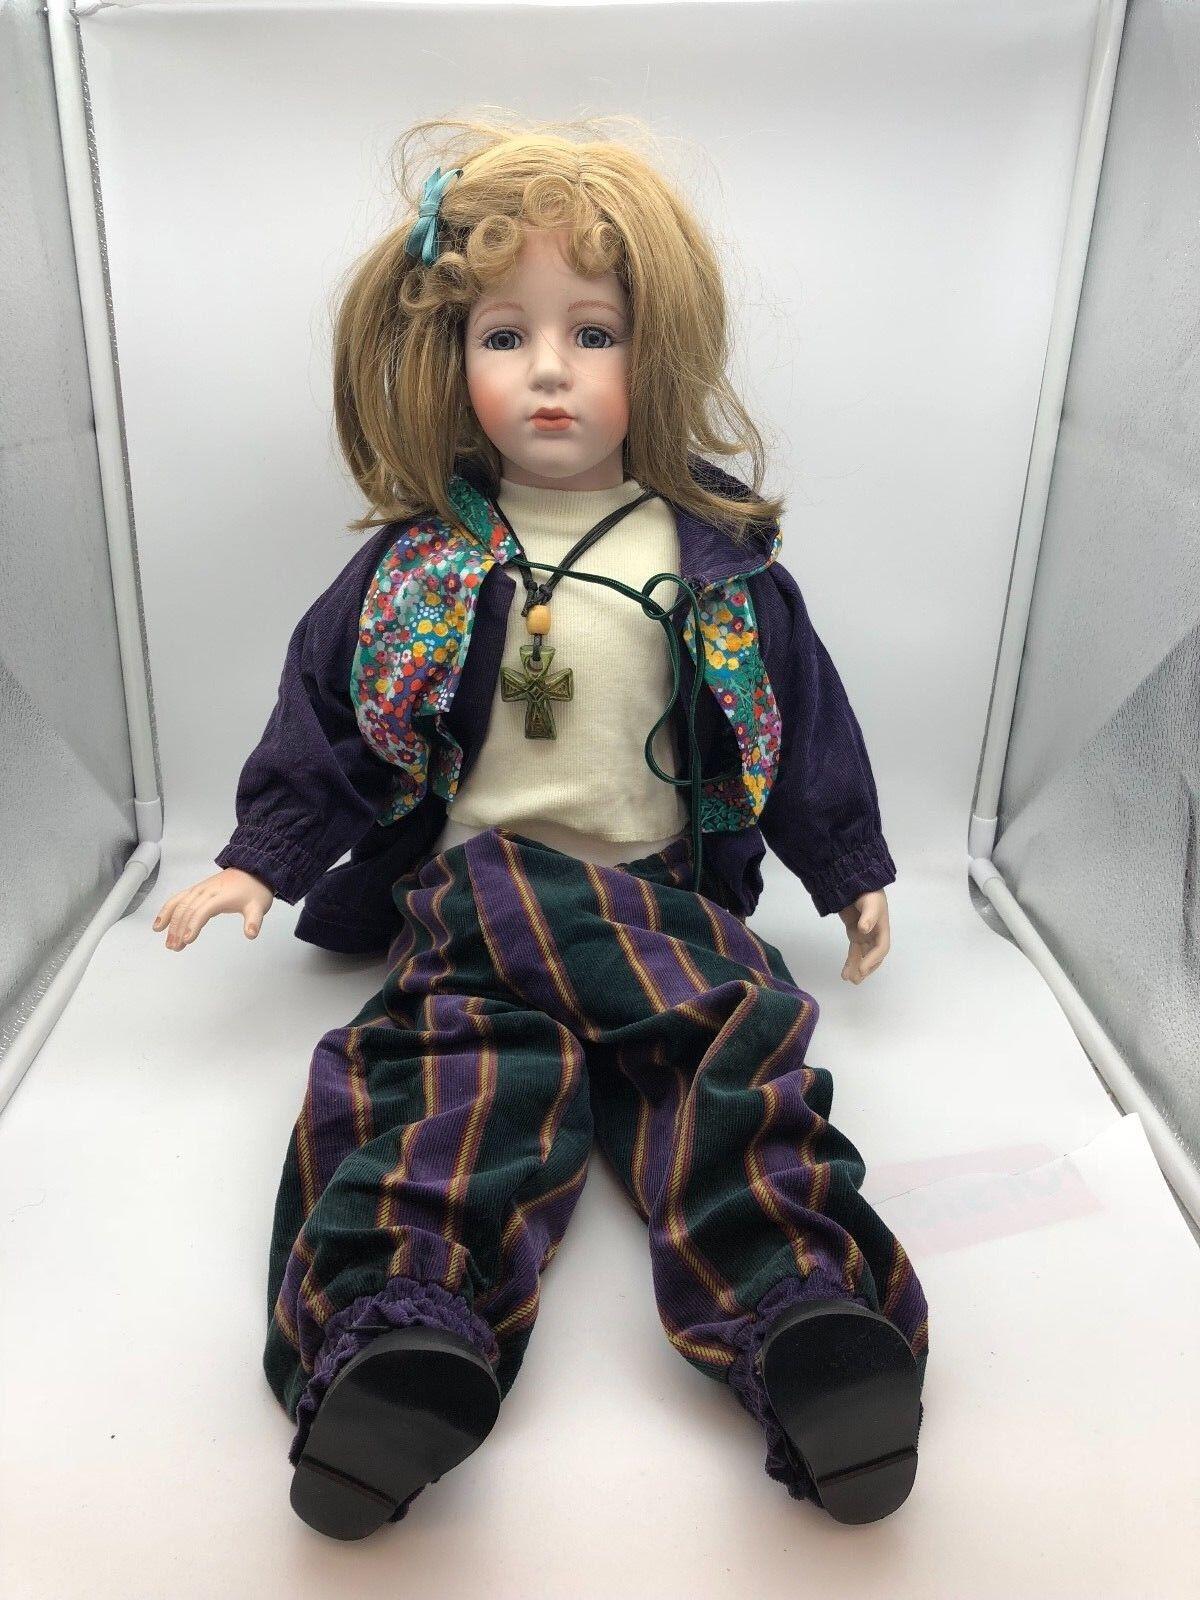 Artistas muñeca muñeca de porcelana 66 cm. top estado